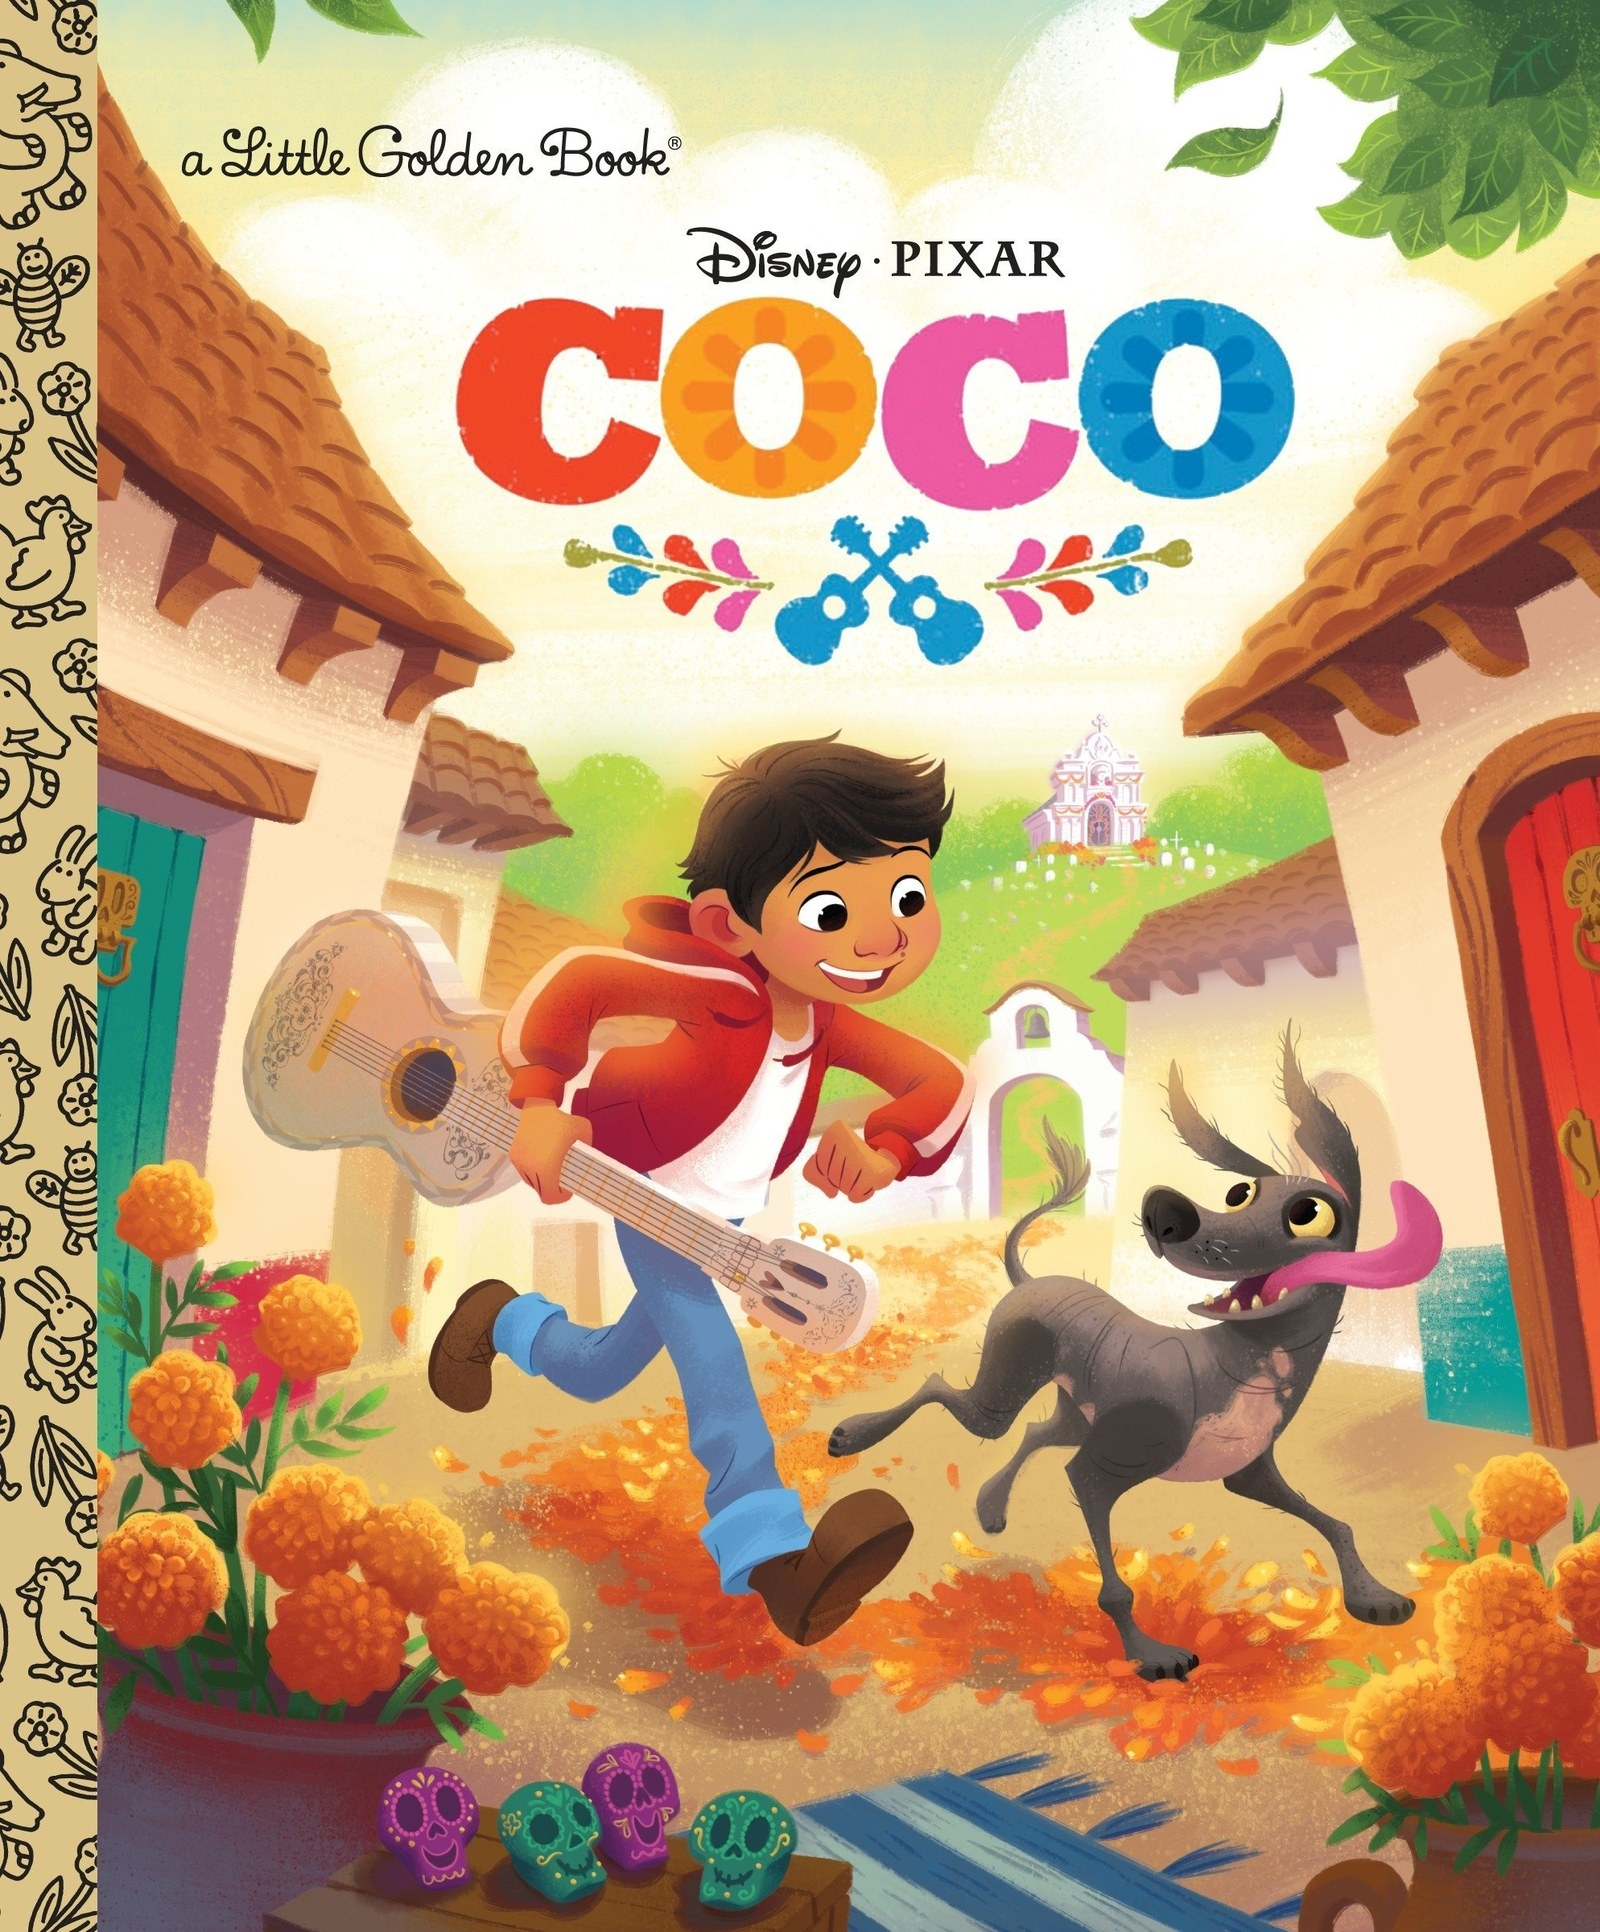 A Little Golden Book of Disney Pixar's Coco.